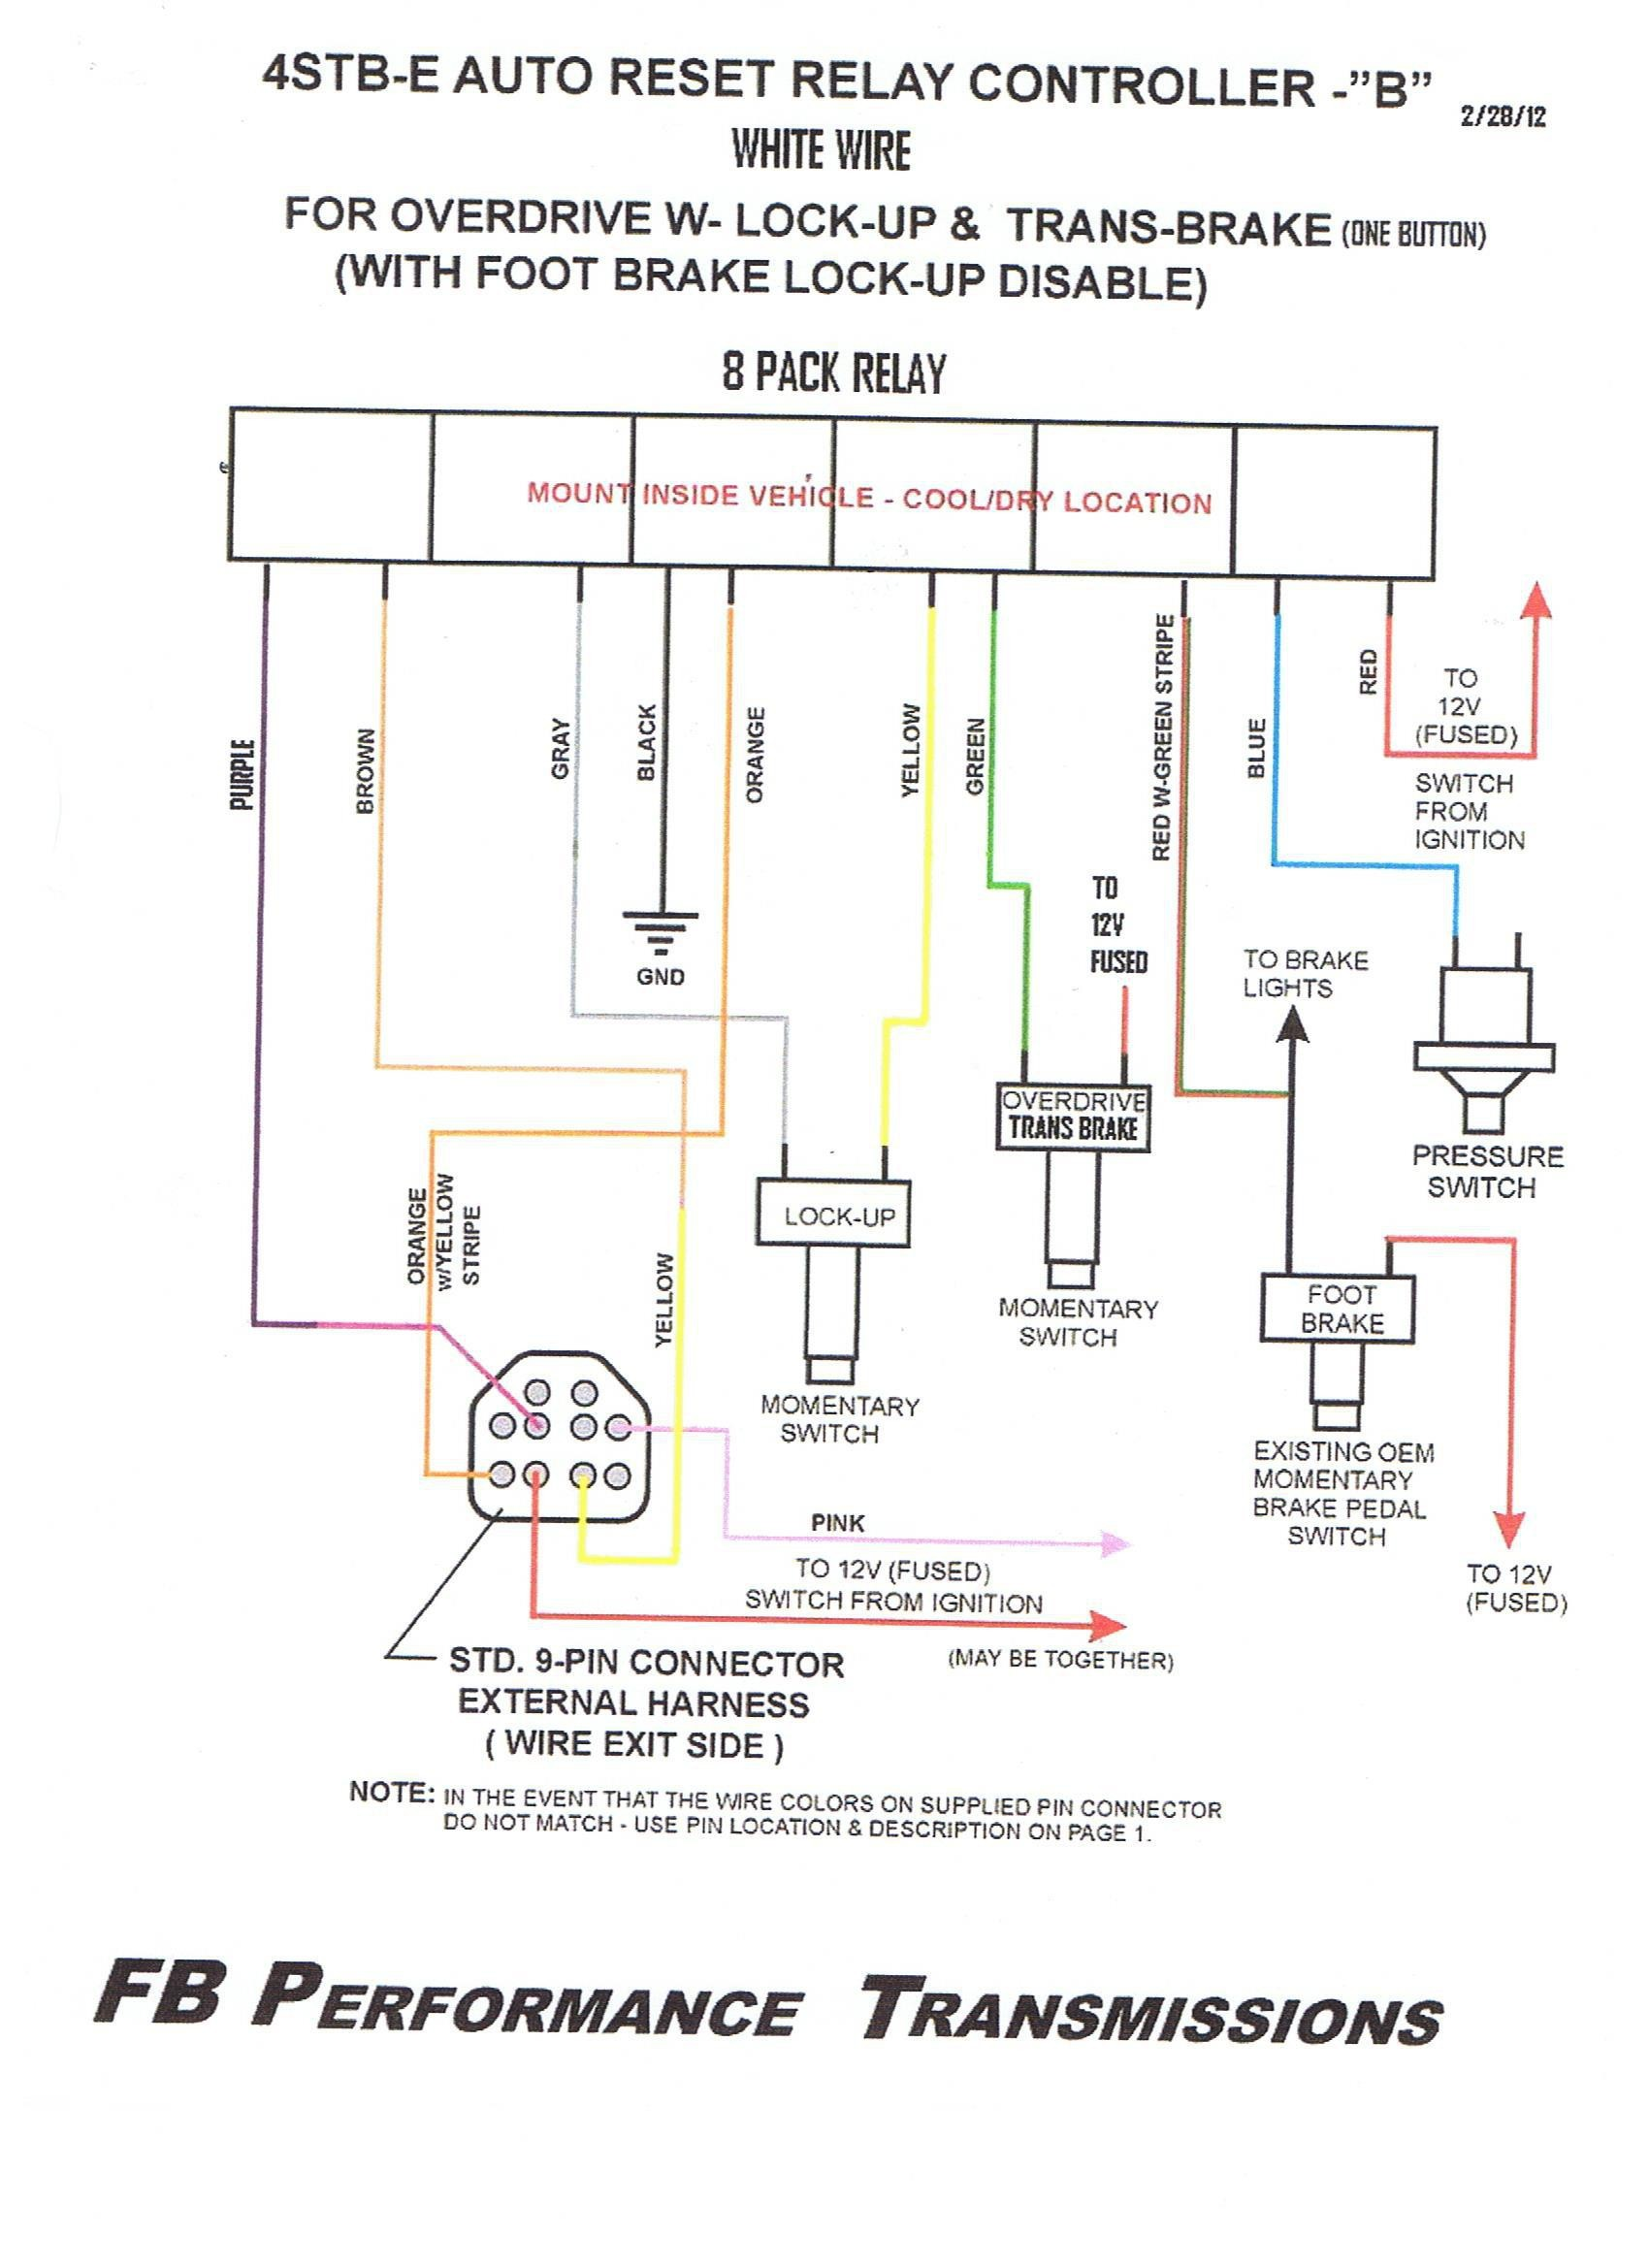 1966 Mustang Neutral Safety Switch Wiring Diagram Schematics Push Botton Trusted Diagrams U2022 Rh 66 42 81 37 95 Gm